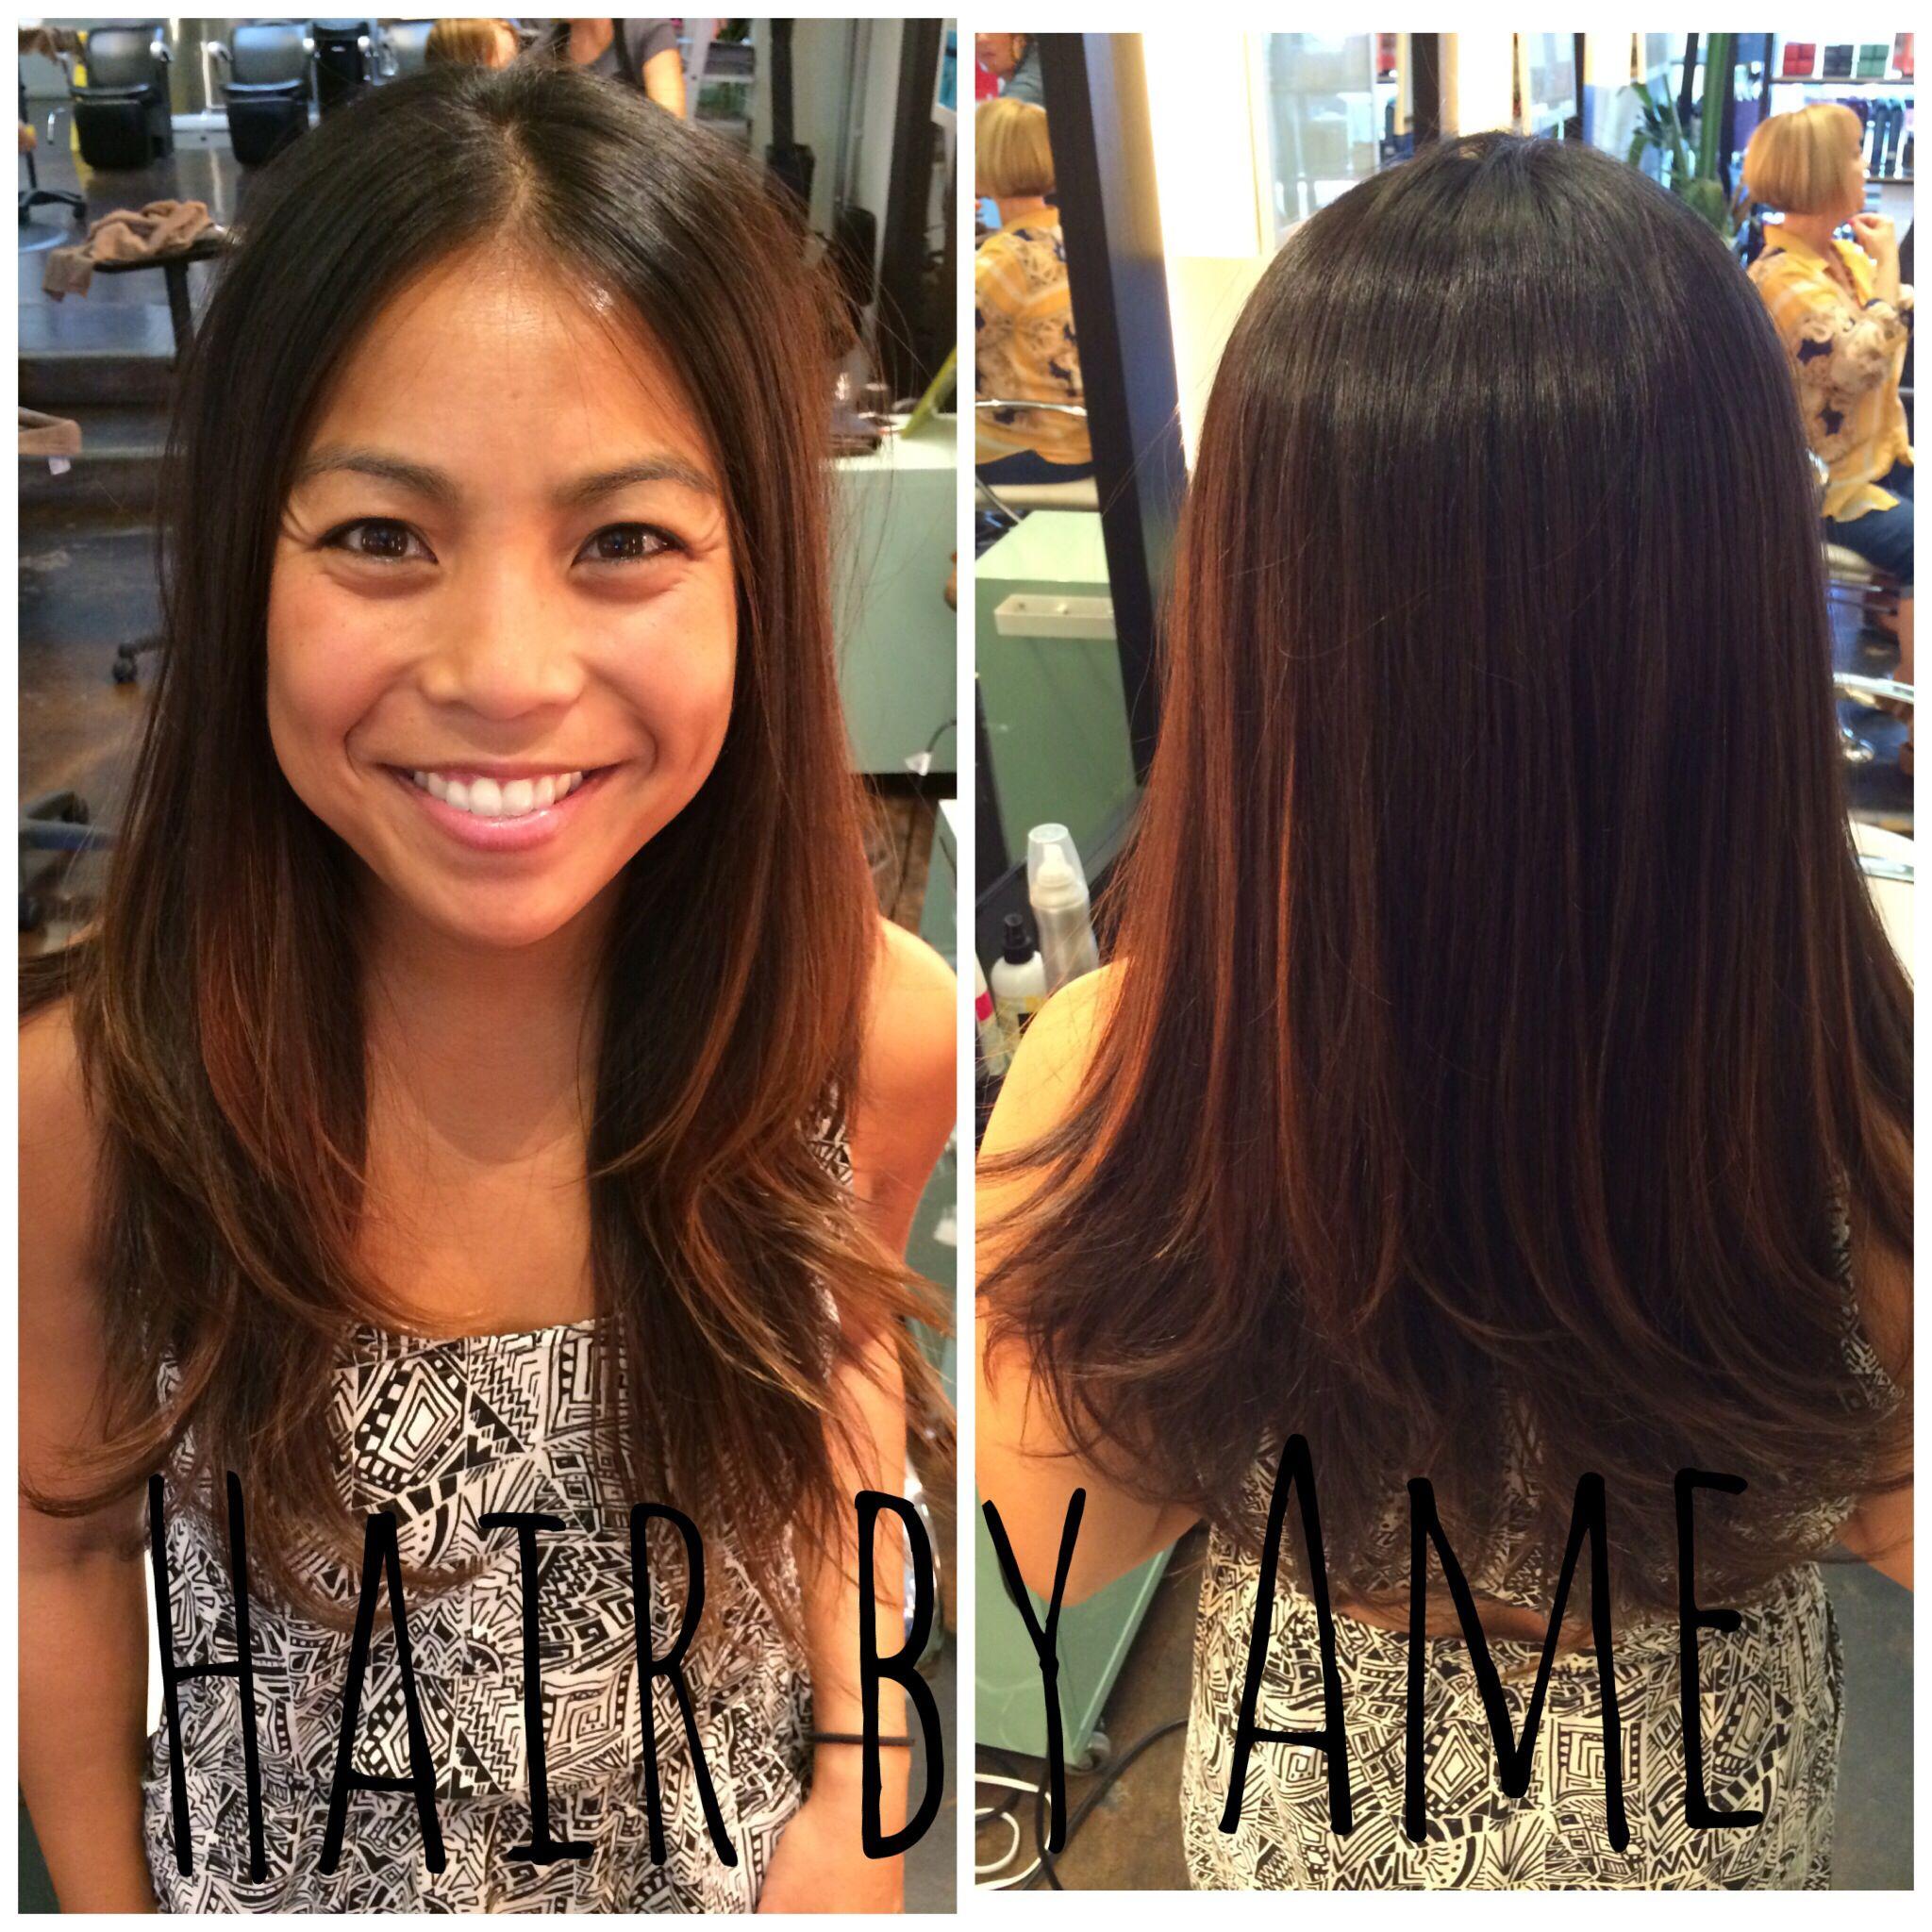 Long Layered Haircut Cut Specialist The Lab A Salon San Diego